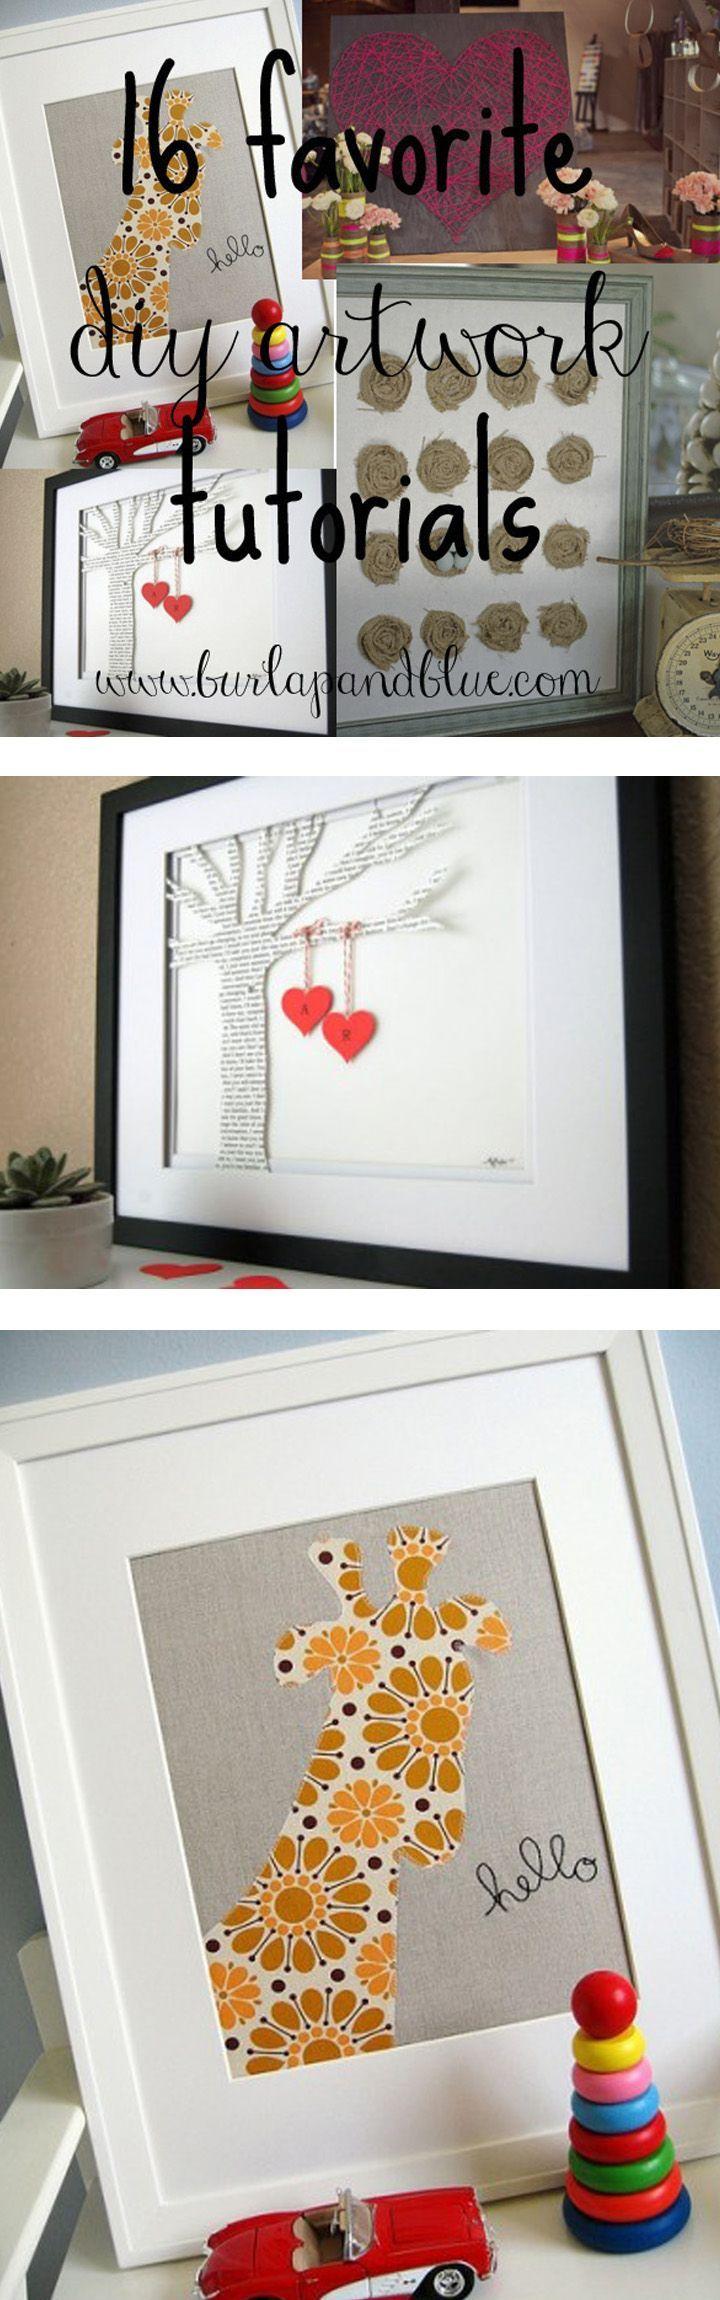 Favorite DIY Artwork Tutorials! Your empty walls need these ideas!